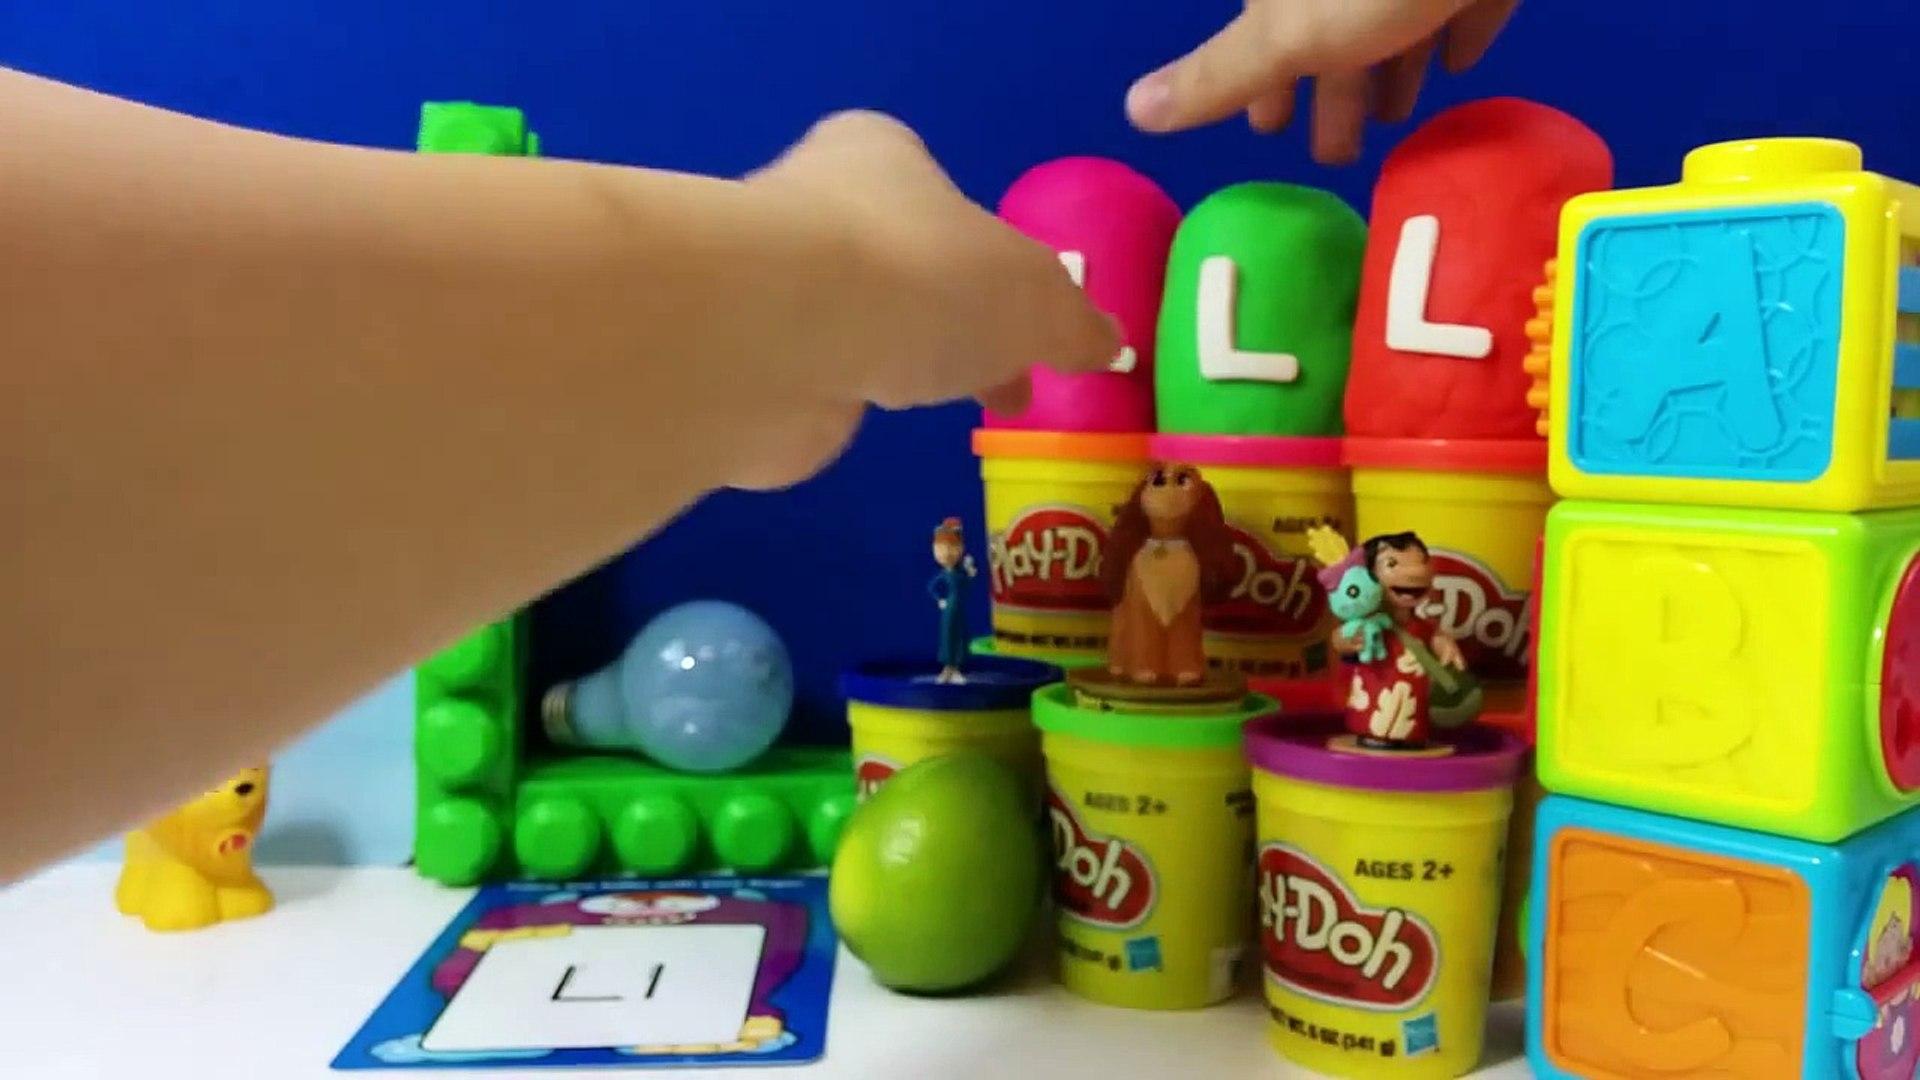 The Letter L with ABC Surprise Eggs   Luke Skywalker Lilo Lightning McQueen Lady Lapras